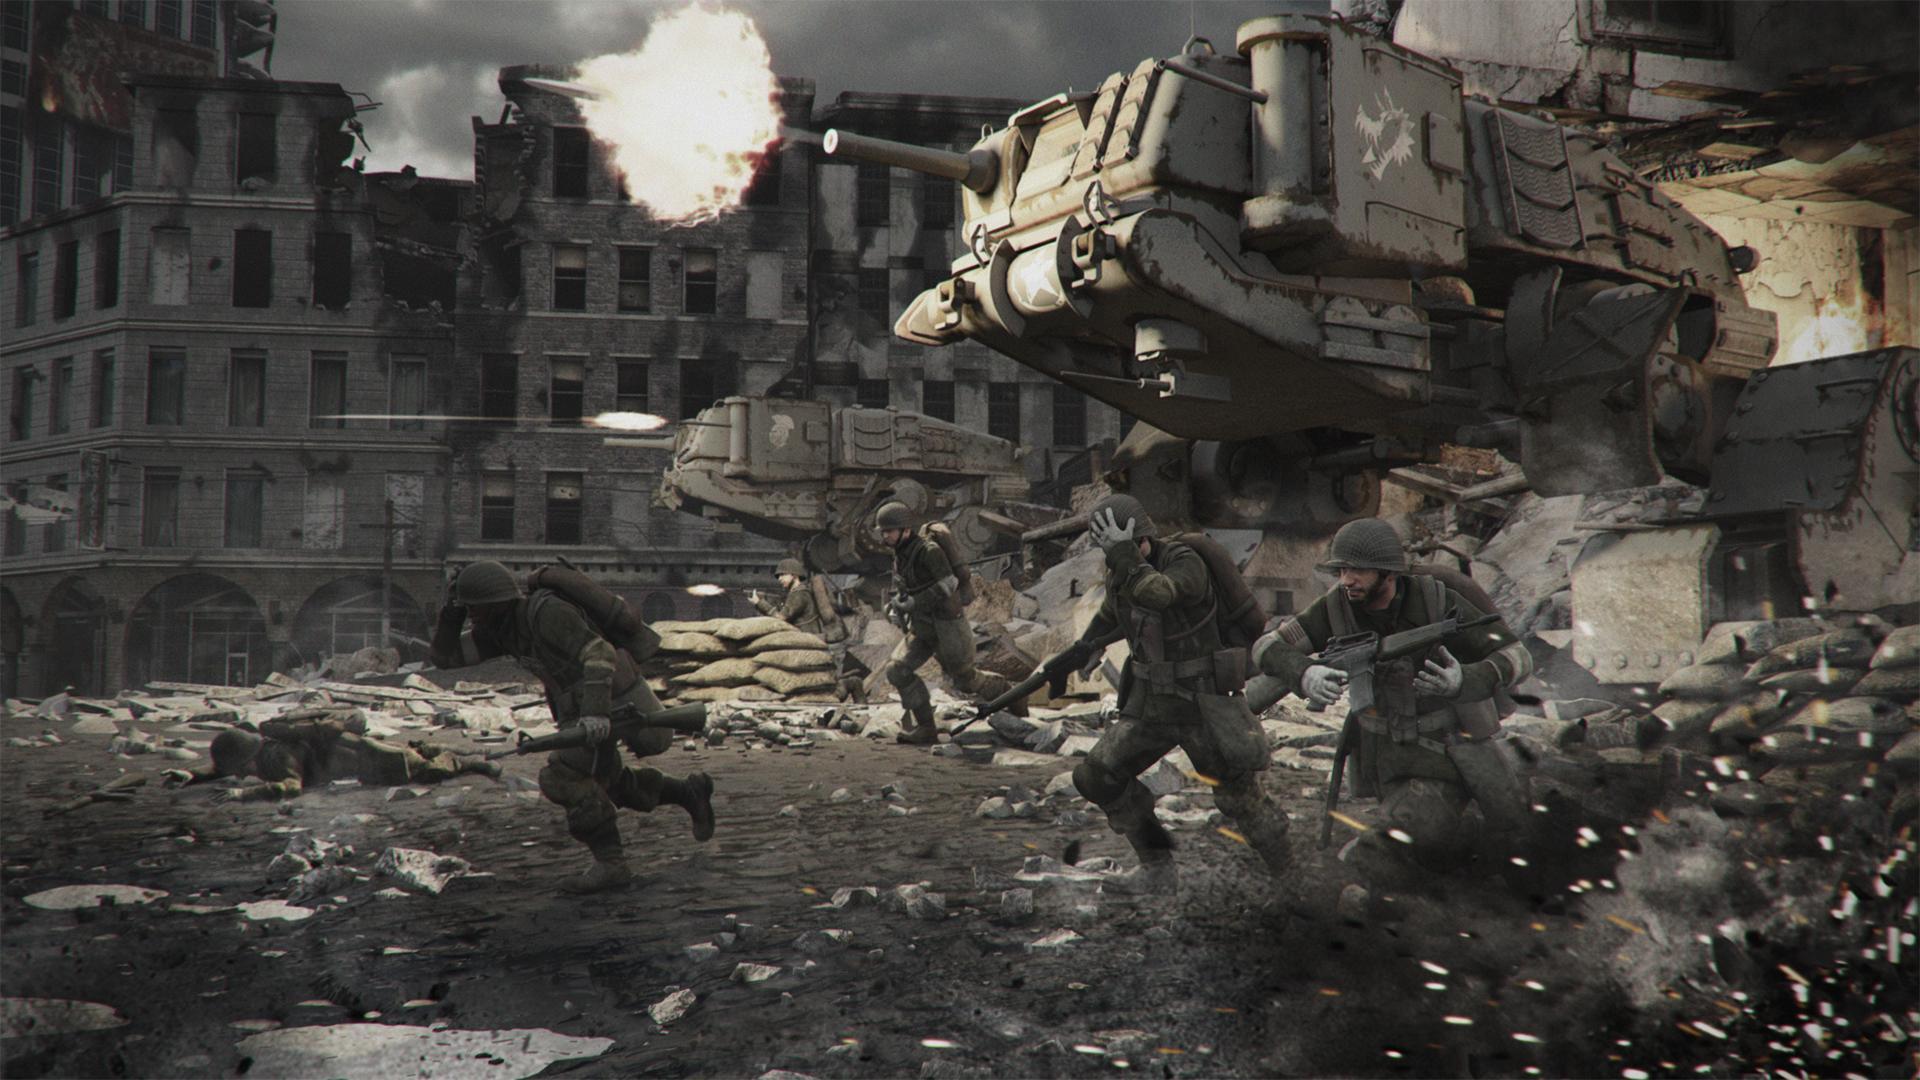 Battle Scene Wallpaper